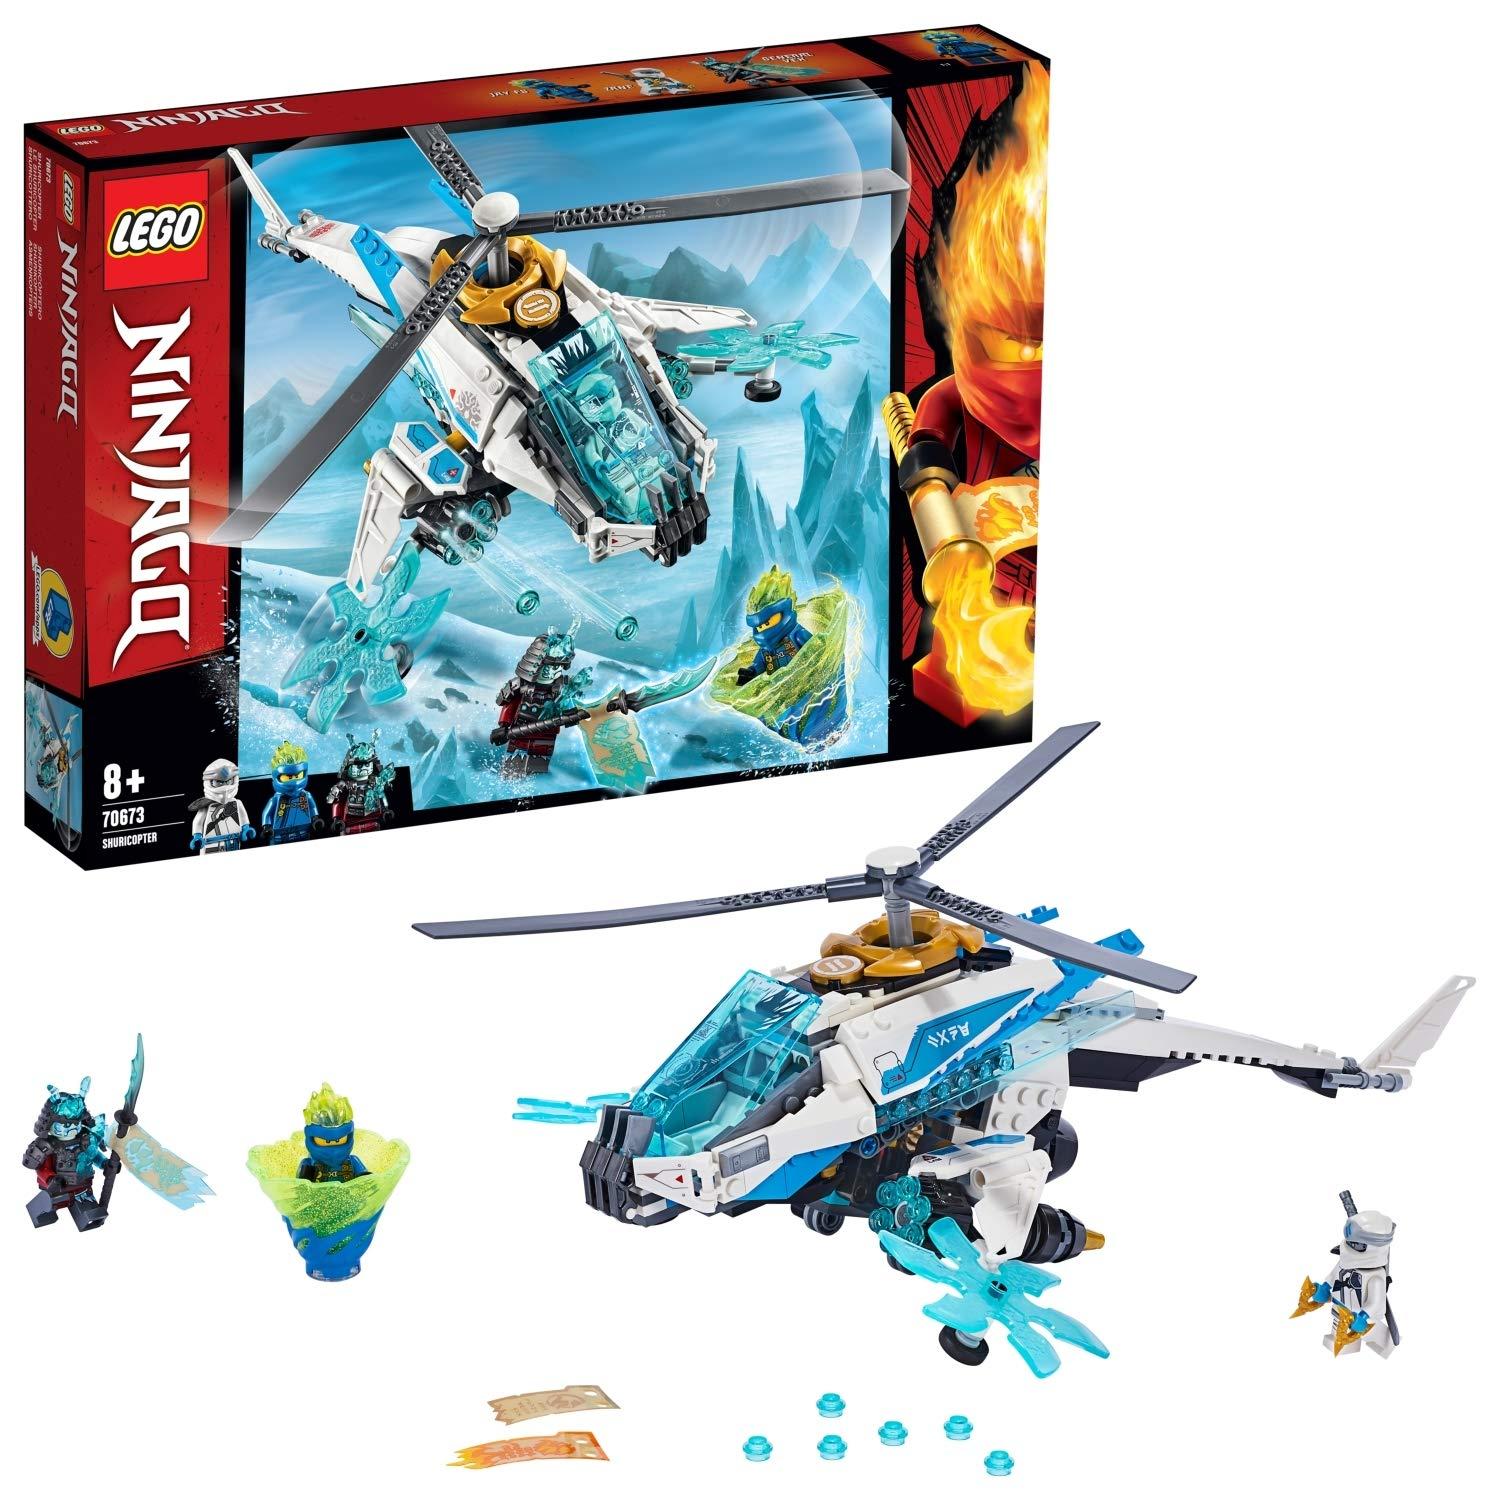 LEGO 70673 NINJAGO ShuriCopter Ninja Helicopter Toy Set £15 (Prime) / £19.49 (Non Prime) @ Amazon